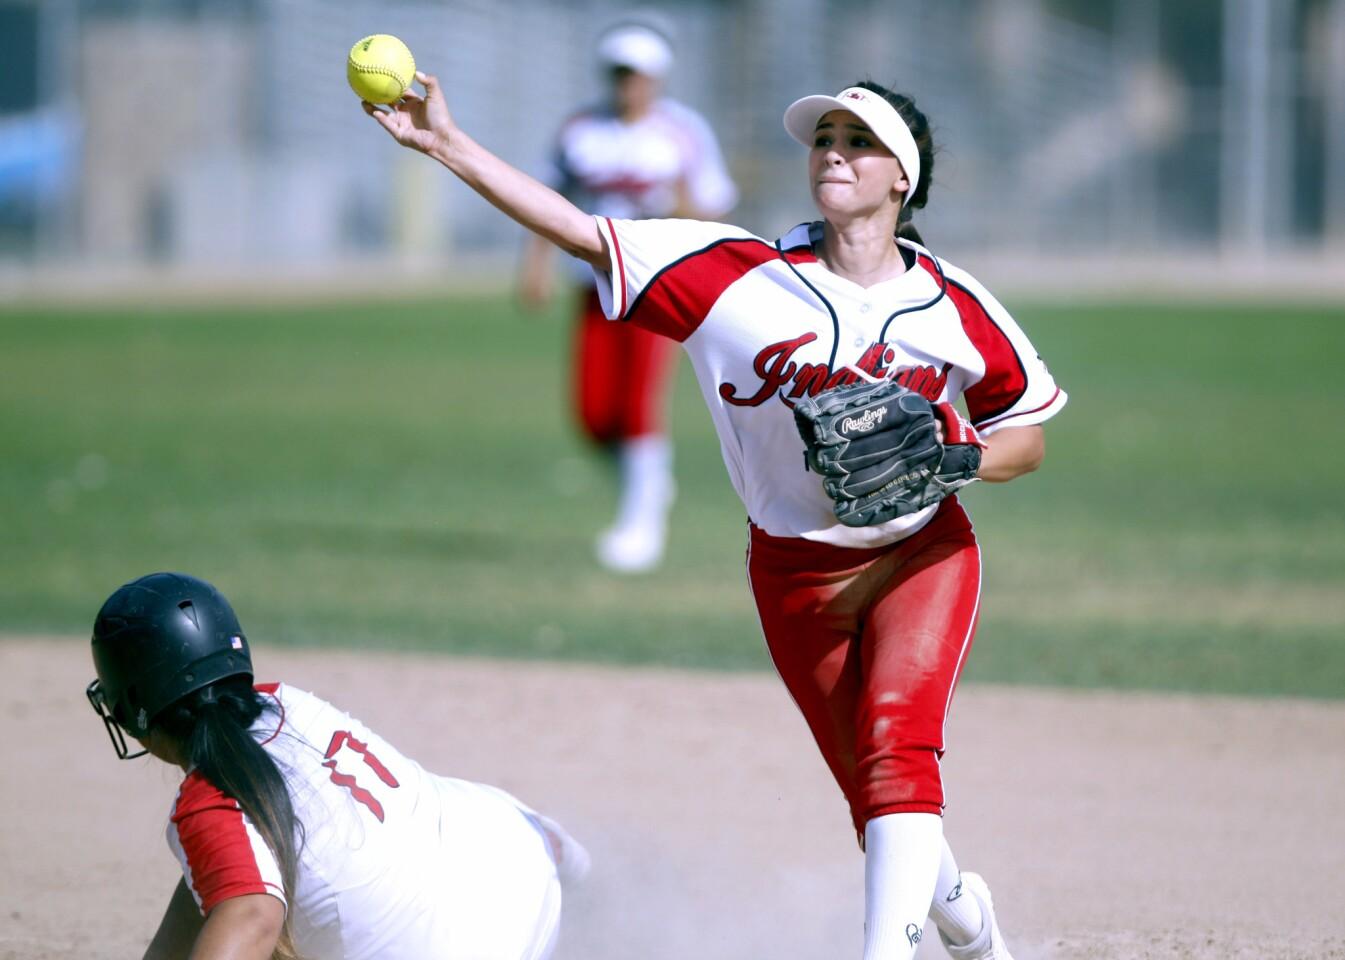 Photo Gallery: Glendale High School softball vs. Burroughs High School